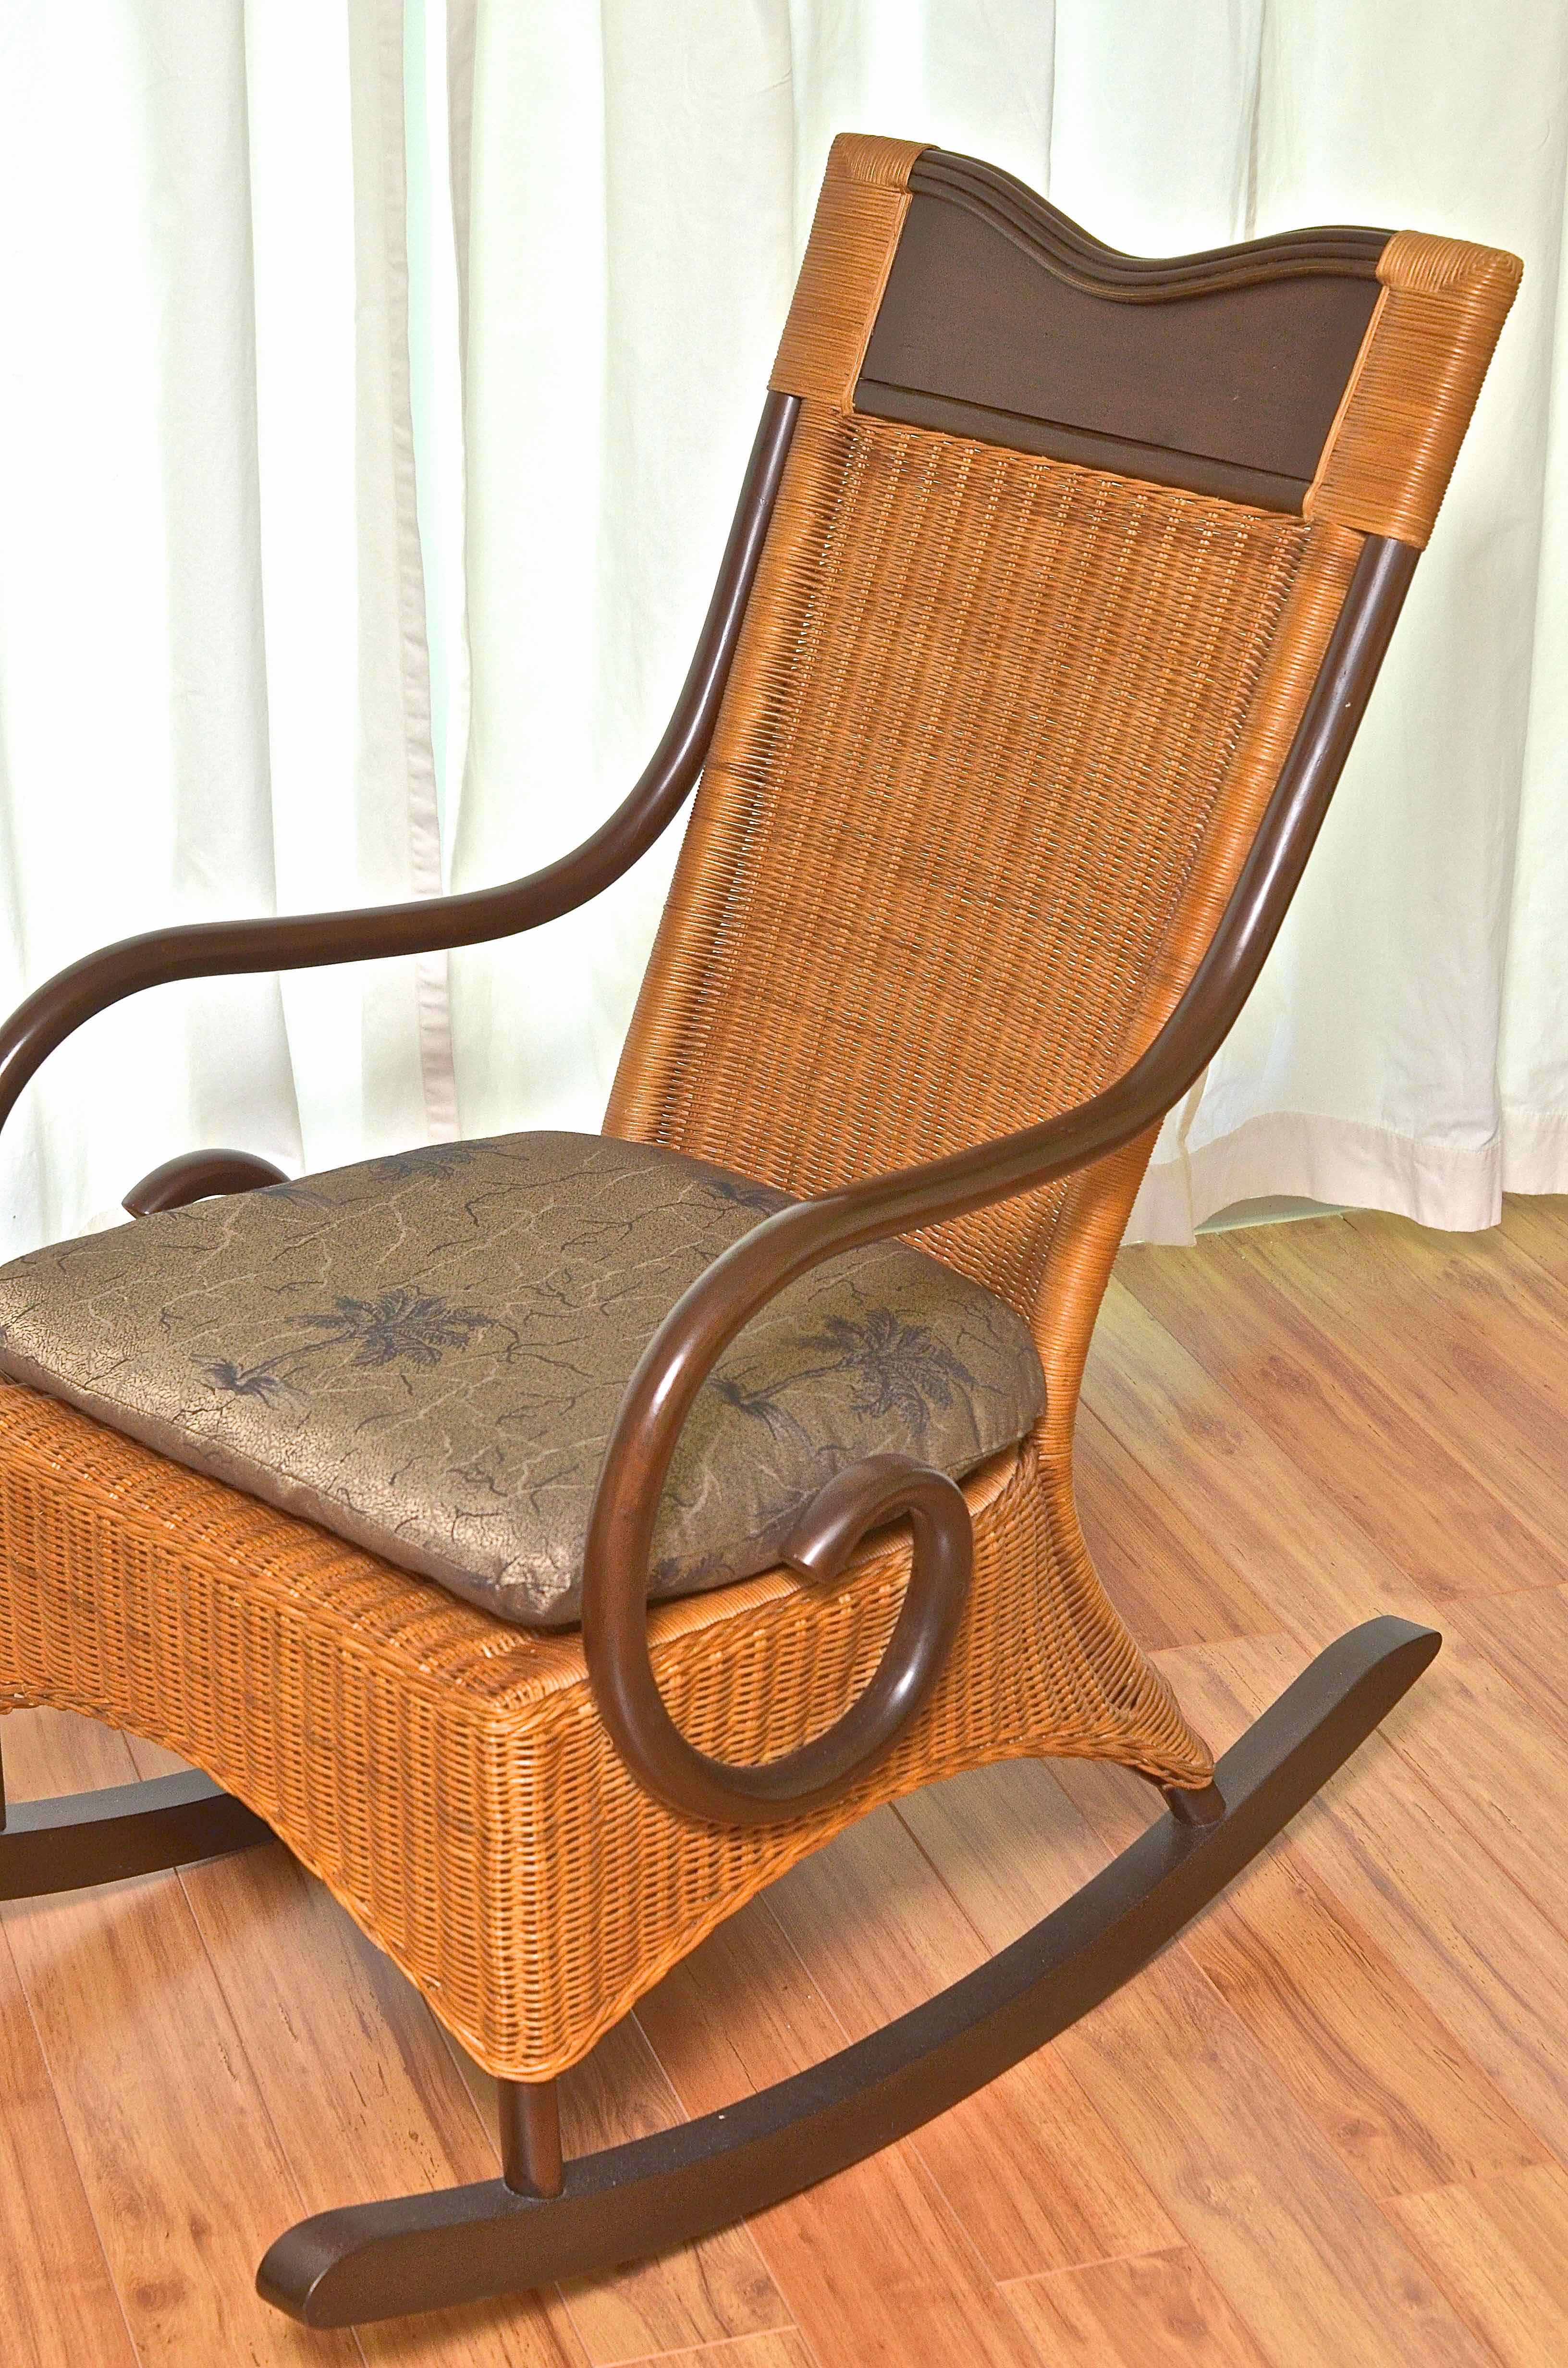 wicker rocking chair pier one indoor swing canada 1 rocker ebth